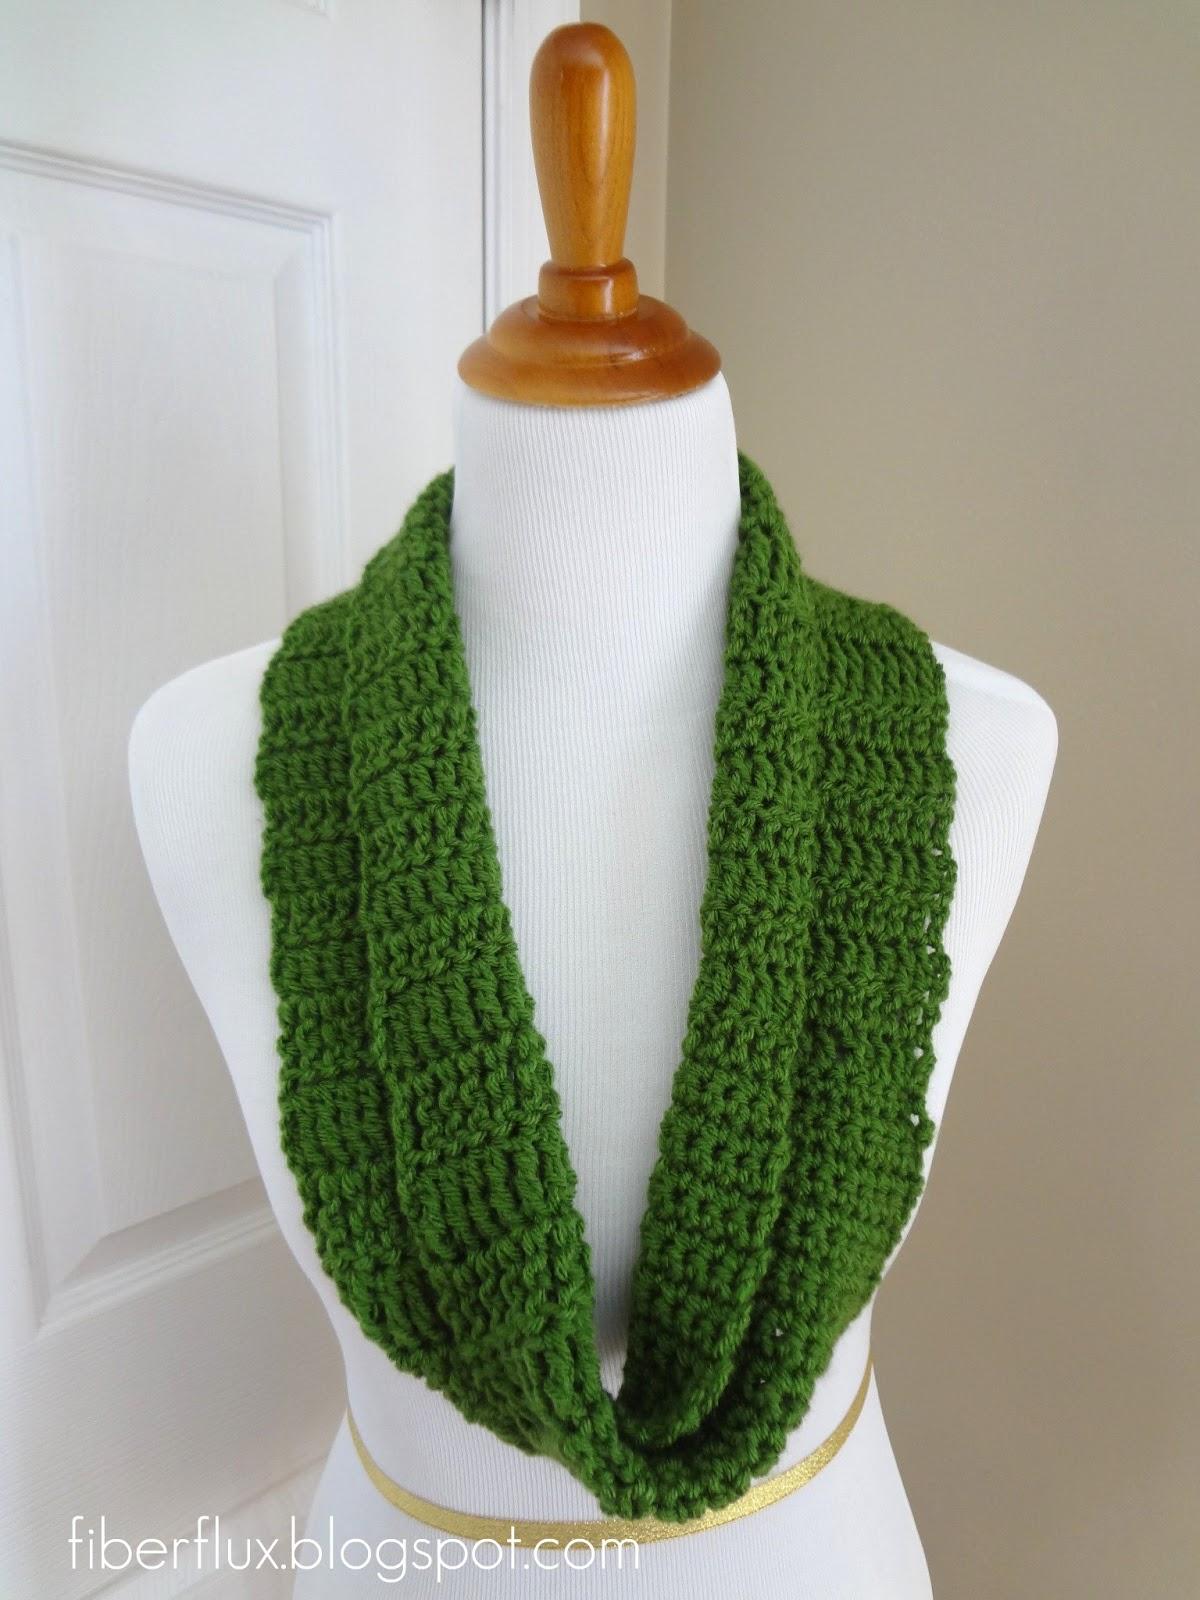 Crochet Patterns Cowl : Fiber Flux: Free Crochet Pattern...Crochet Class Cowl!